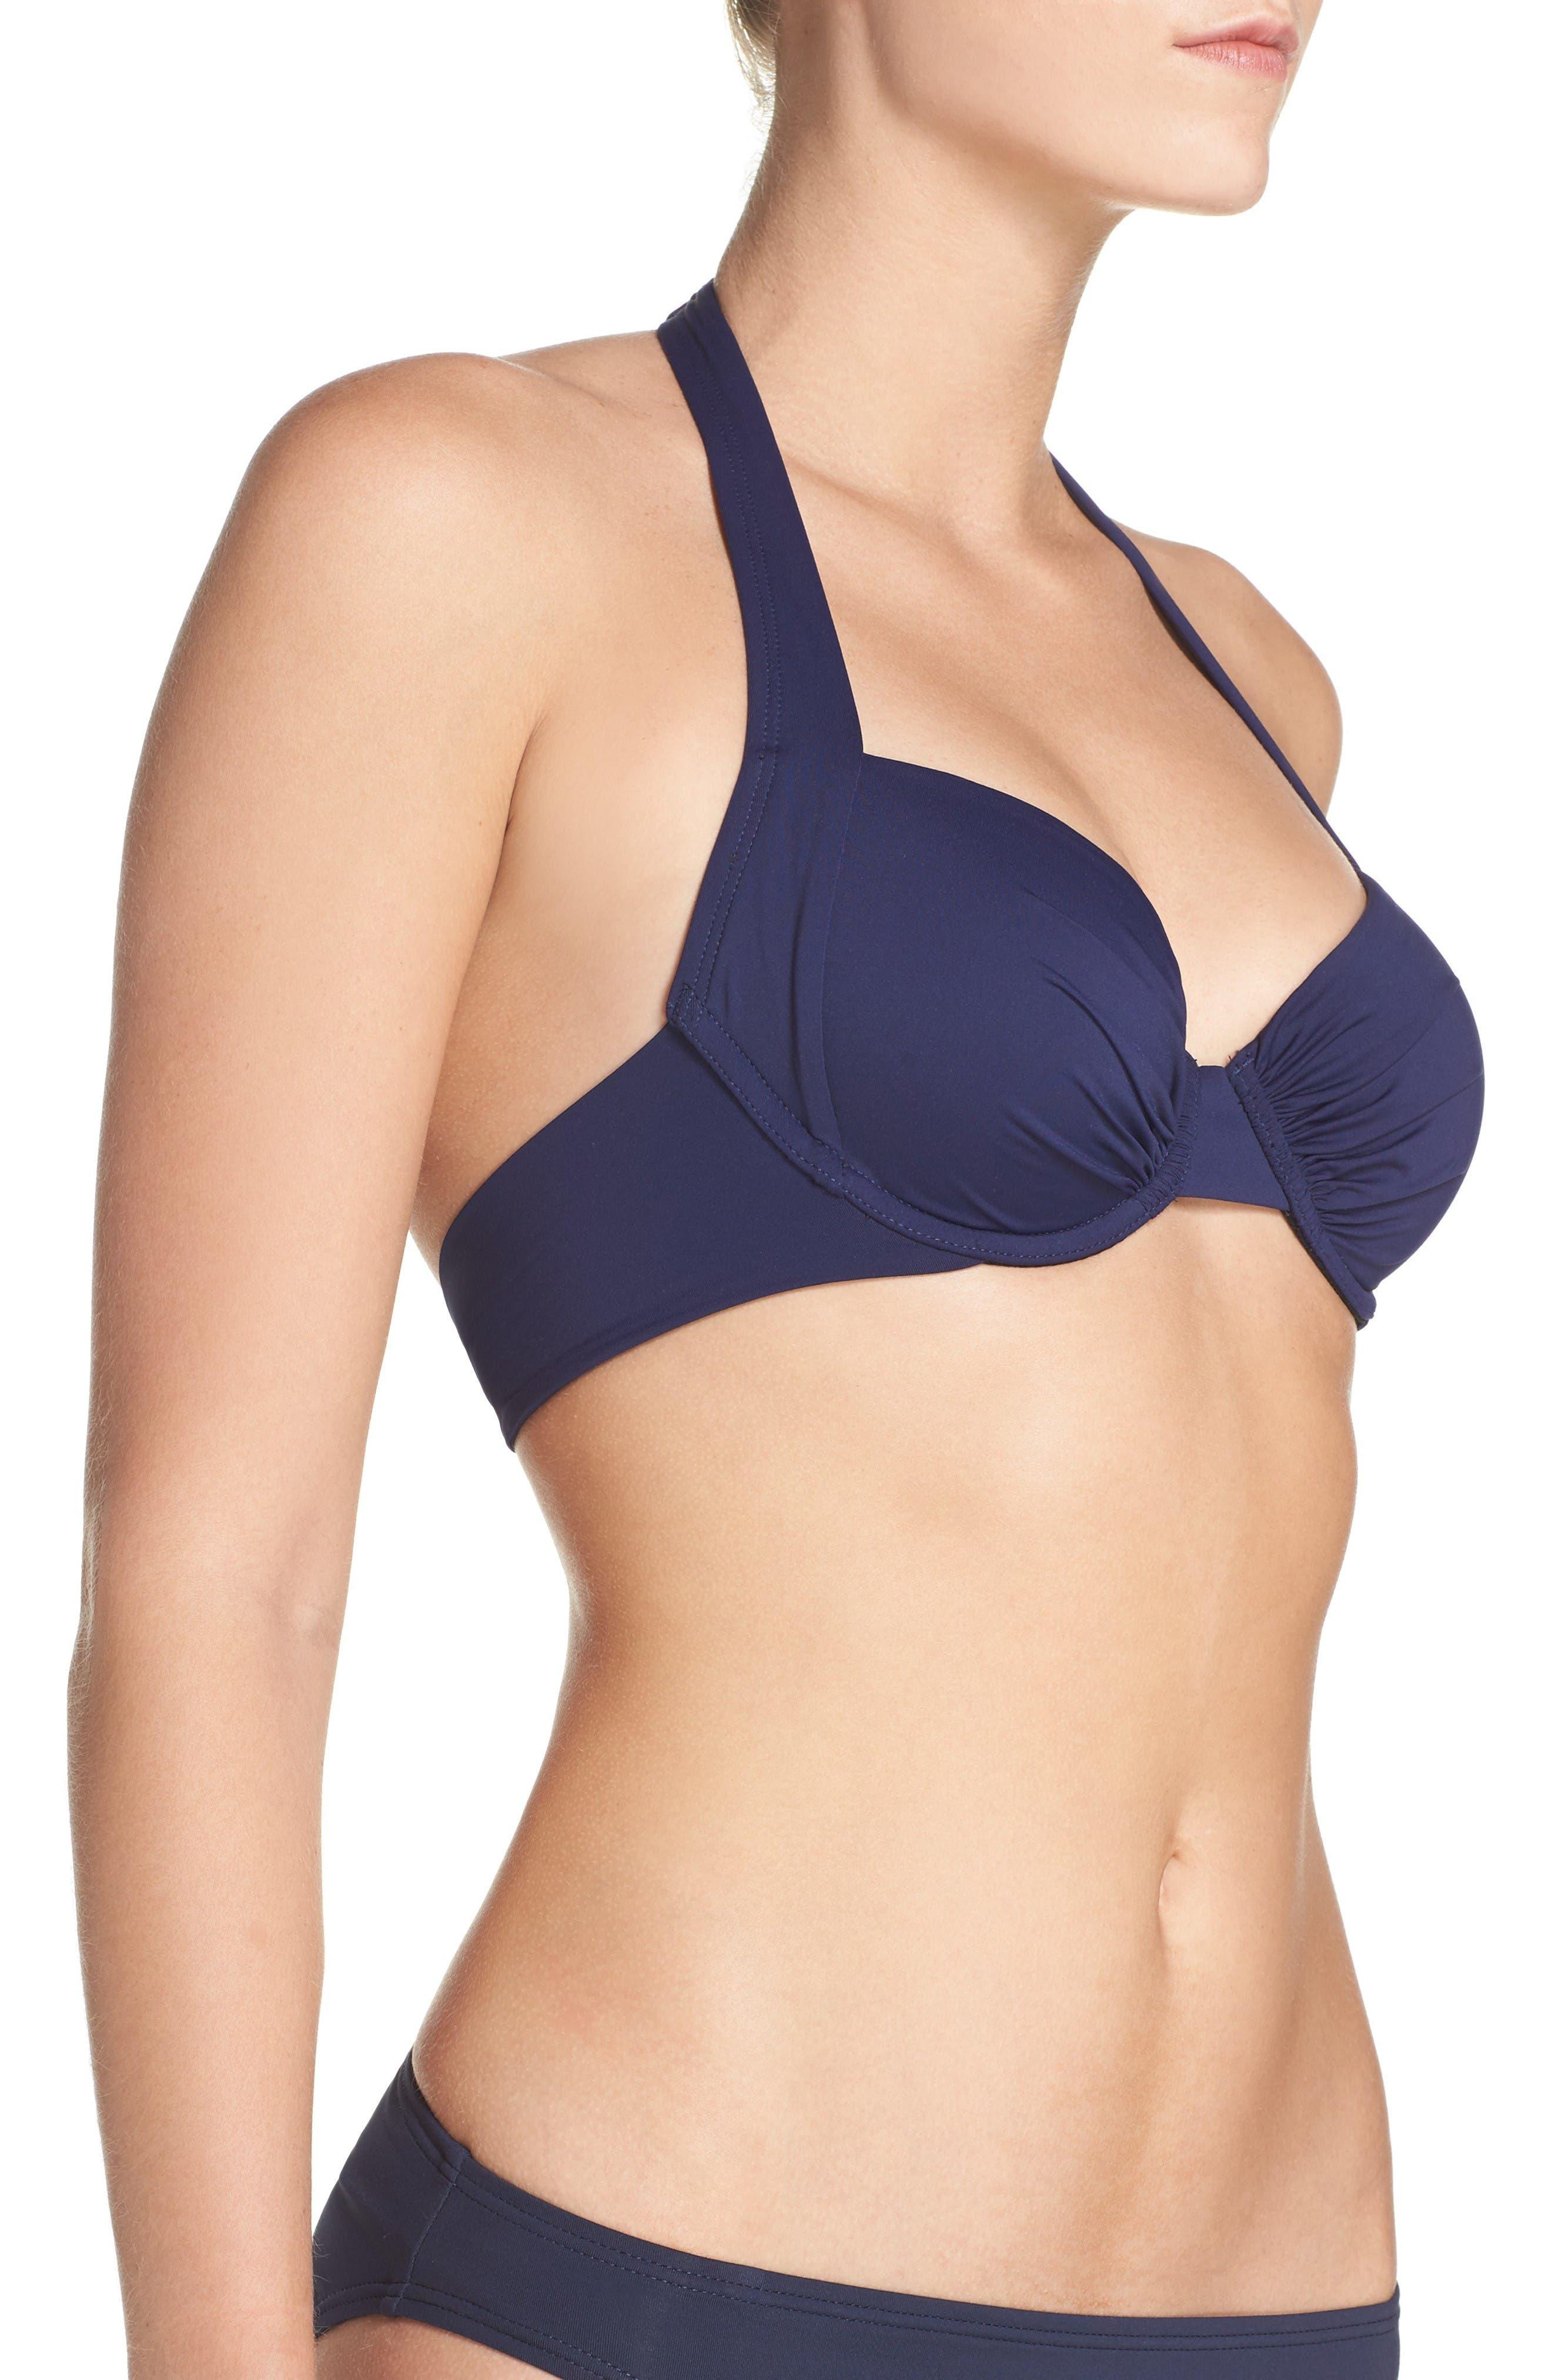 Underwire Halter Bikini Top,                             Alternate thumbnail 3, color,                             Mare Navy